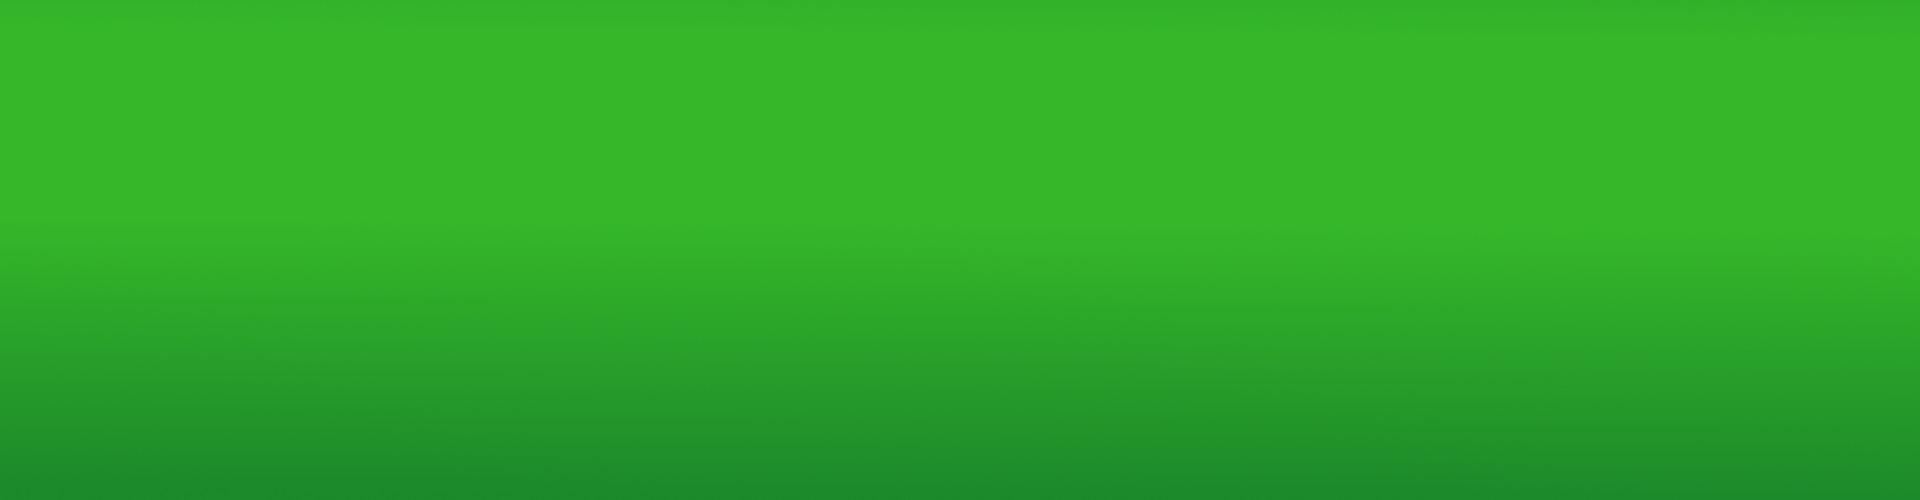 background grün gutachter